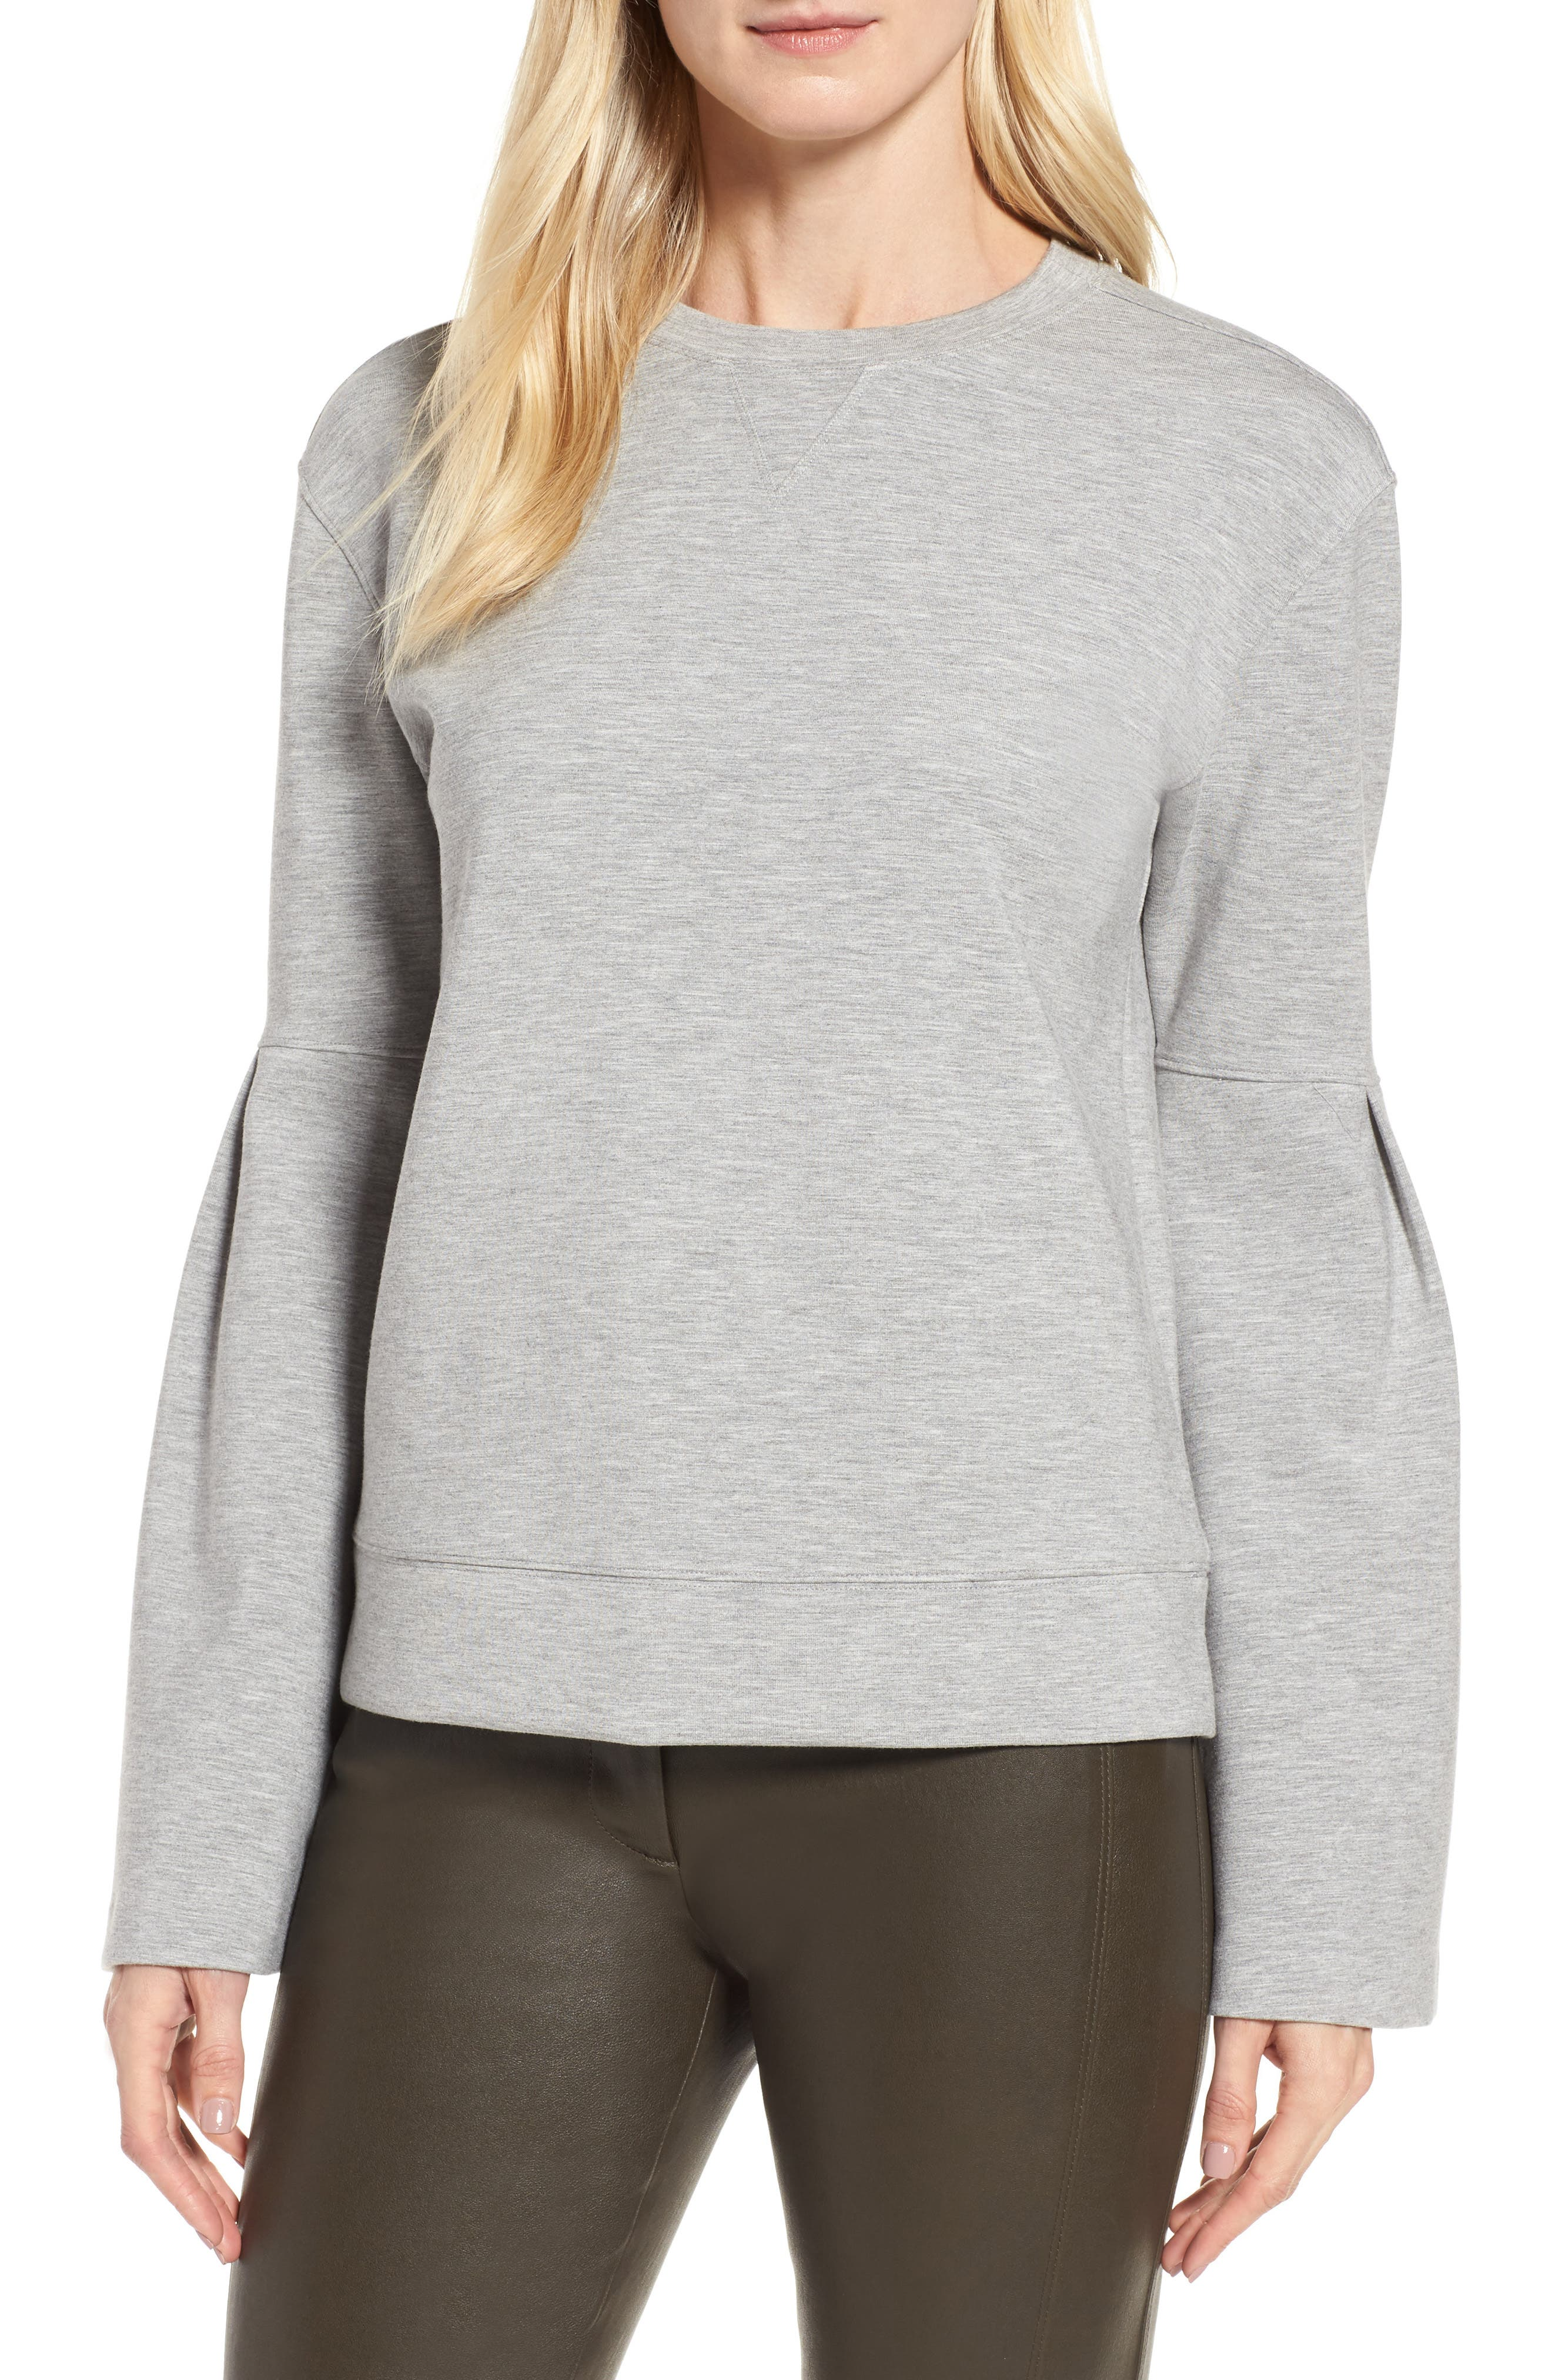 Alternate Image 1 Selected - Nordstrom Signature Bell Sleeve Sweatshirt